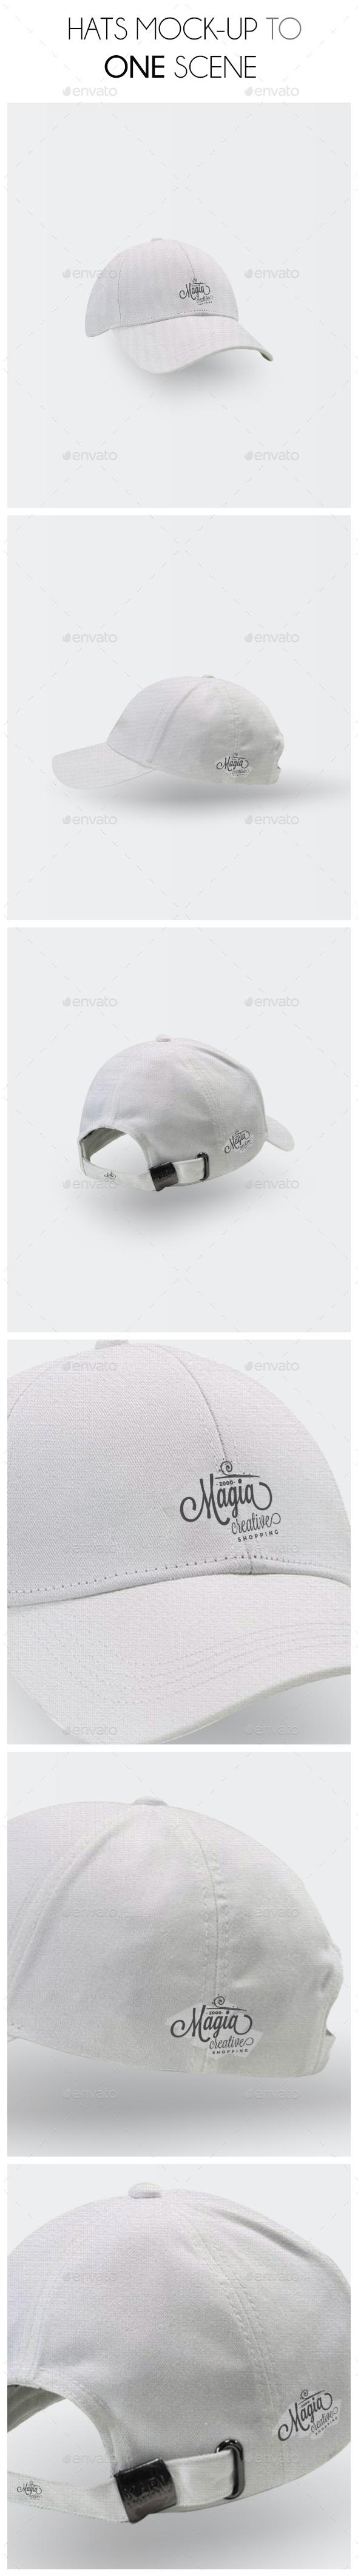 Hats Mockup Scene - Miscellaneous Apparel